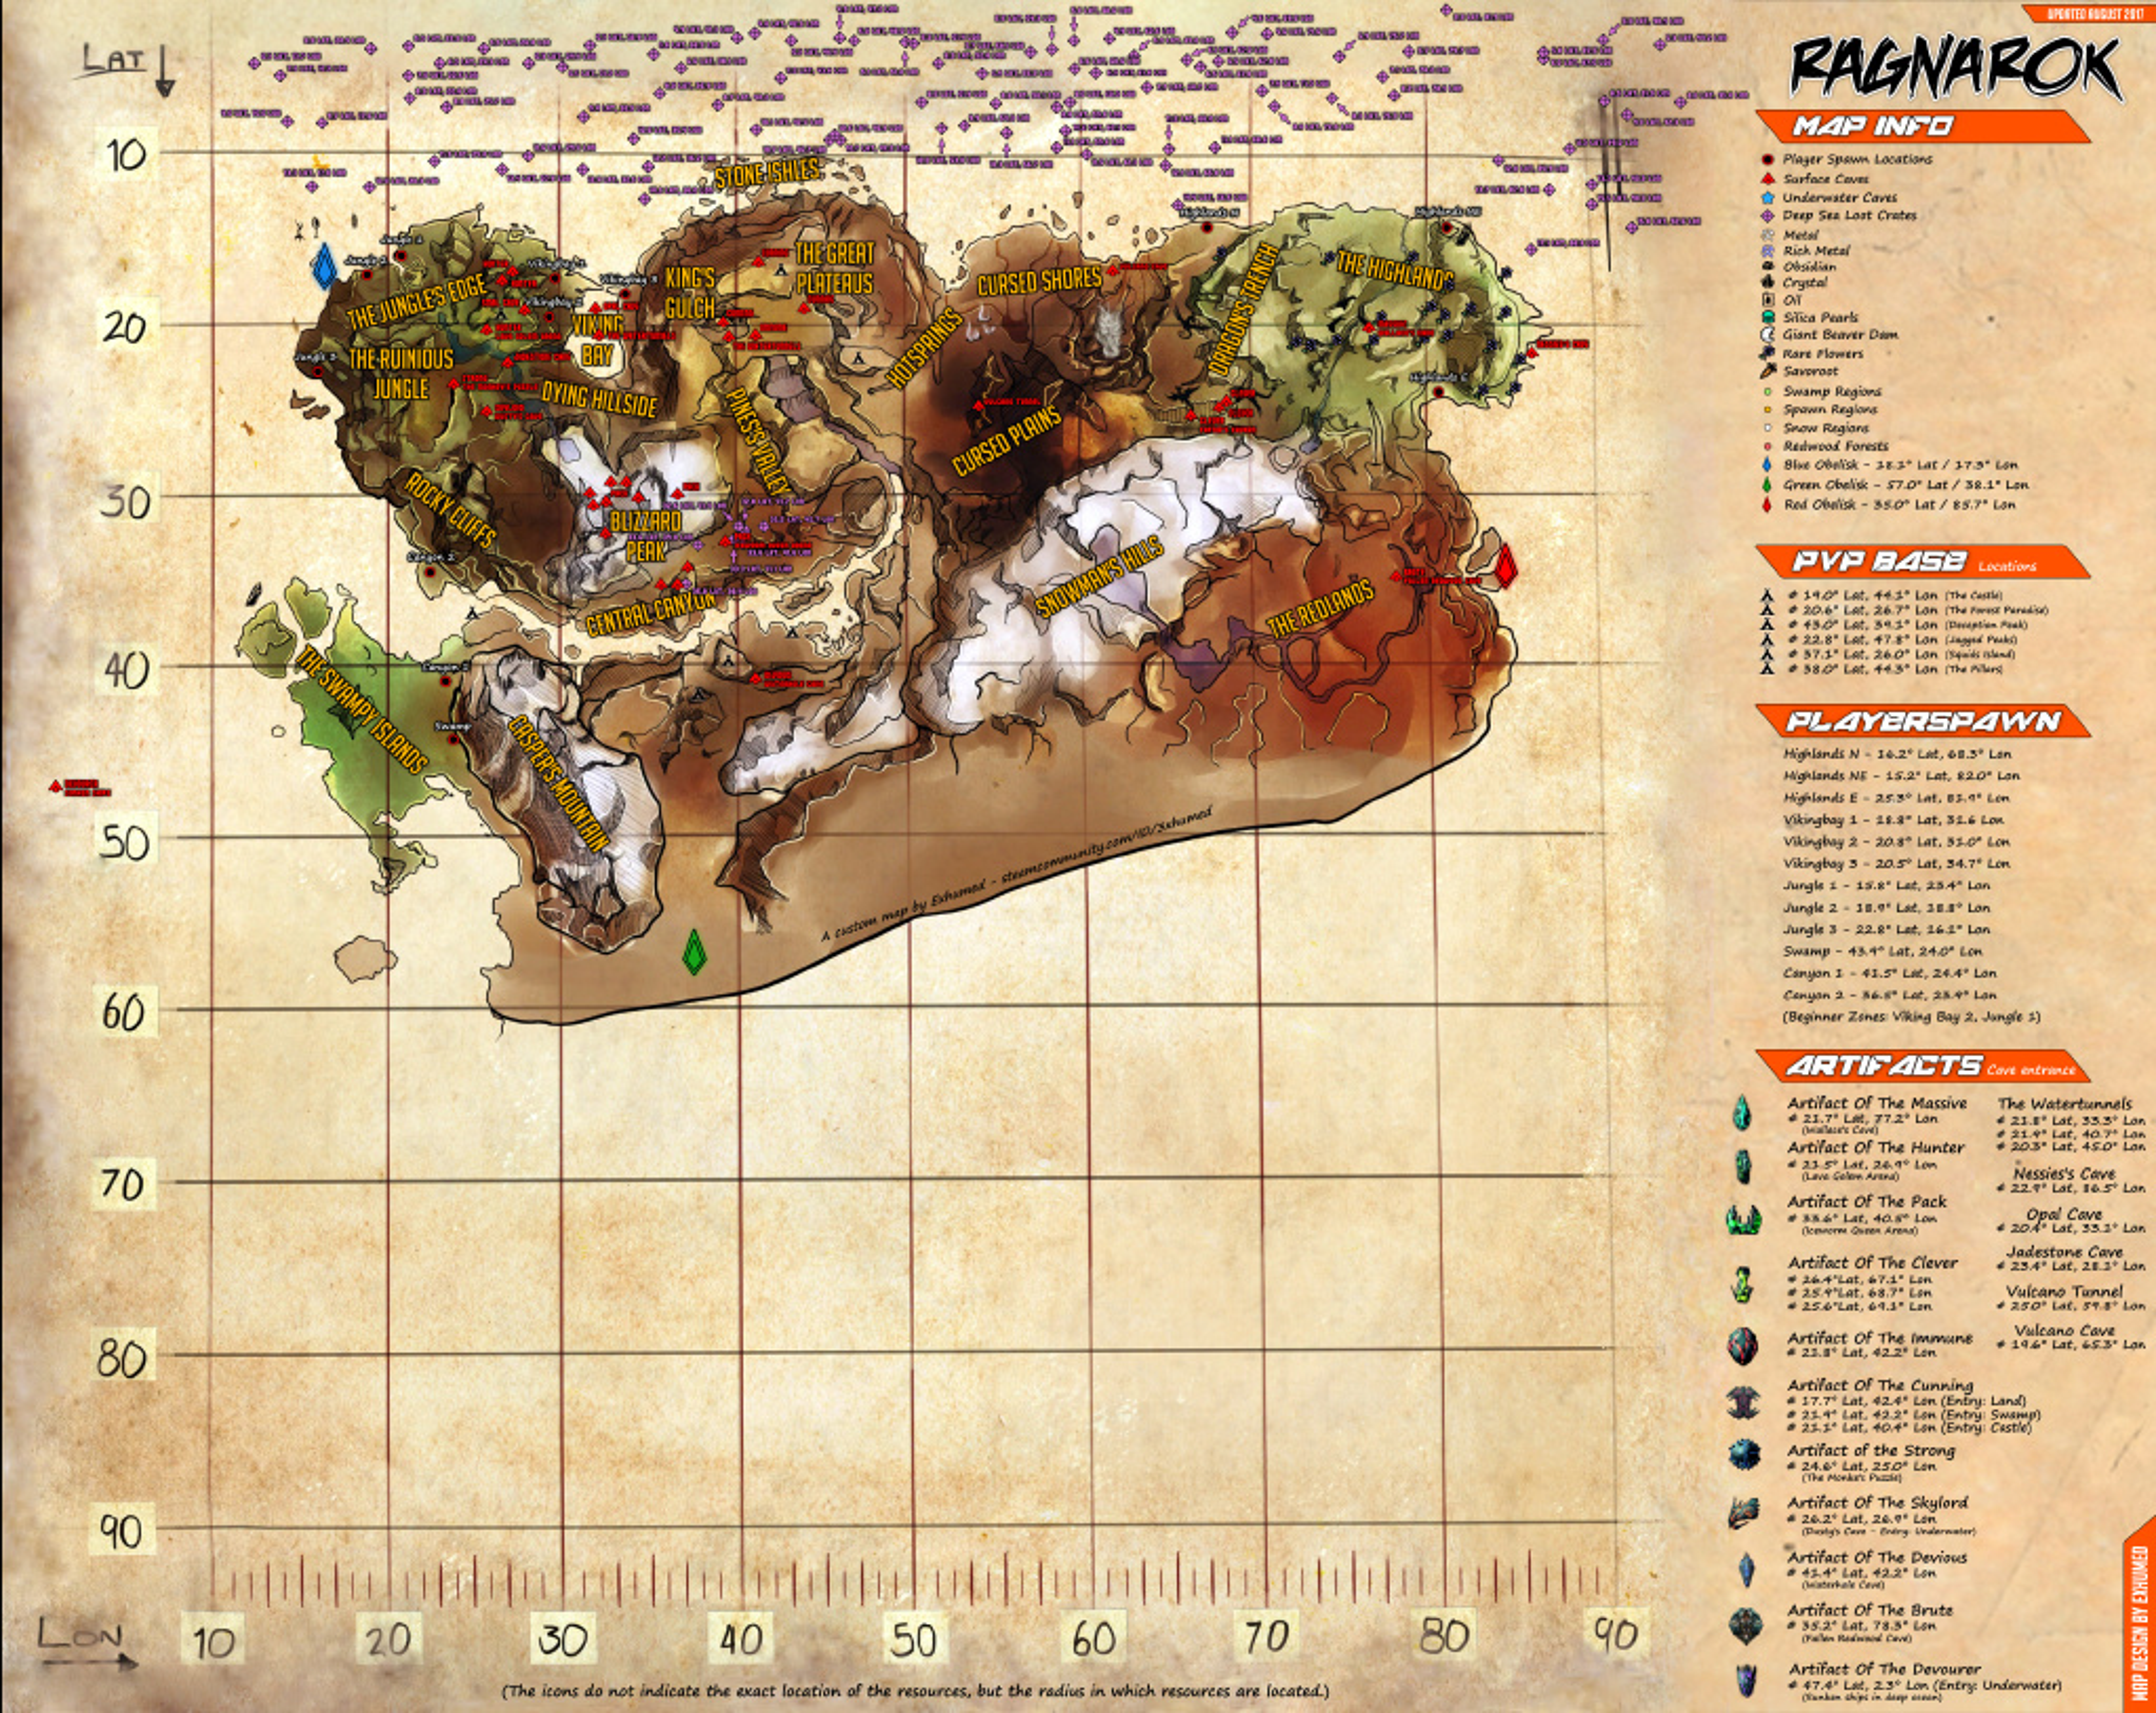 Ark Ragnarok öl Karte.Survival Ark Ragnarok Resource Map Ark The Island Map By Exhumed By